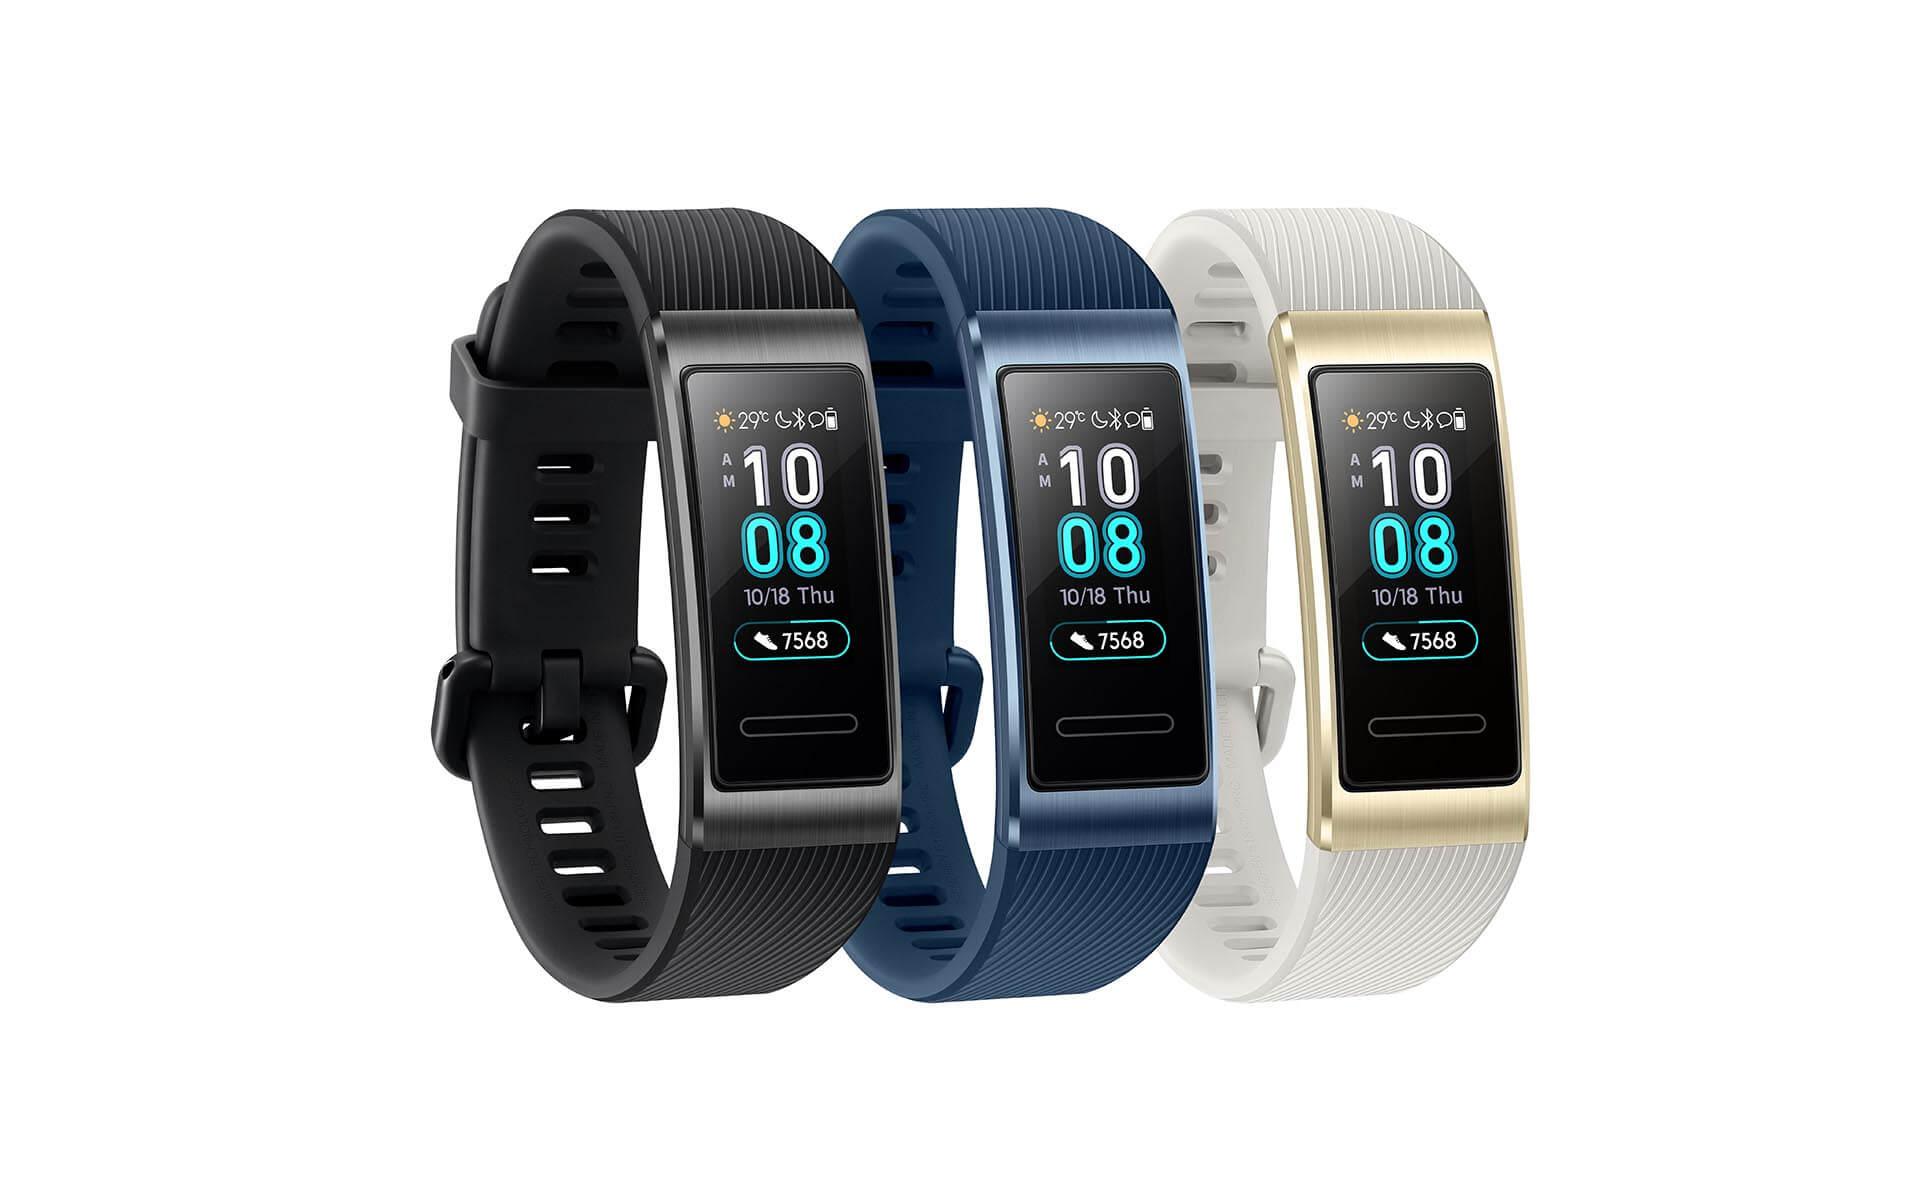 Watch GT, Band 3e und Band 3 Pro: Huawei stellt neue Wearables vor 17 techboys.de • smarte News, auf den Punkt! Watch GT, Band 3e und Band 3 Pro: Huawei stellt neue Wearables vor